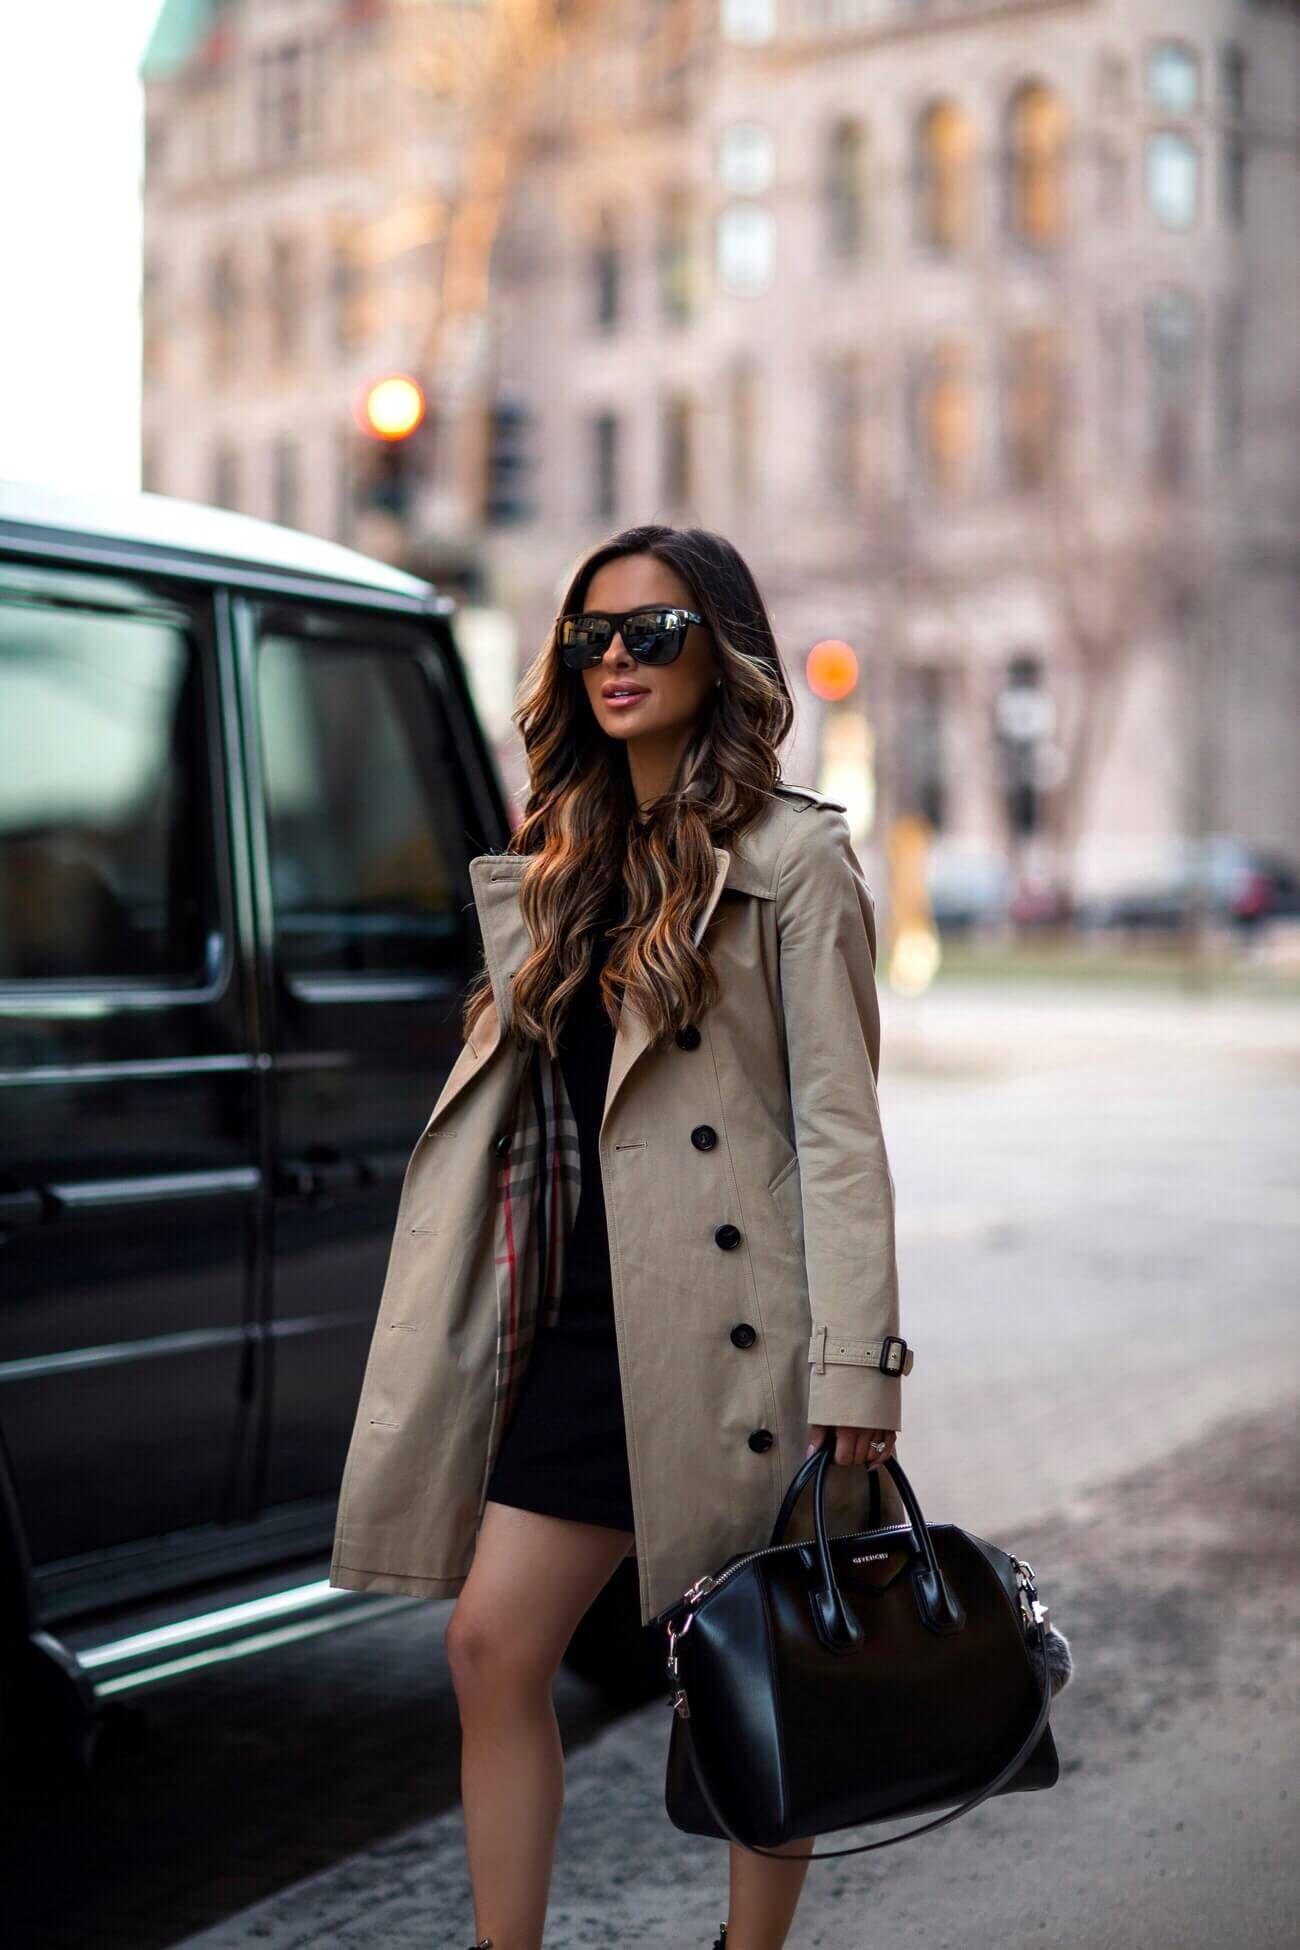 cf55a41c8bea fashion blogger mia mia mine wearing a givenchy antigona bag and a burberry  trench coat